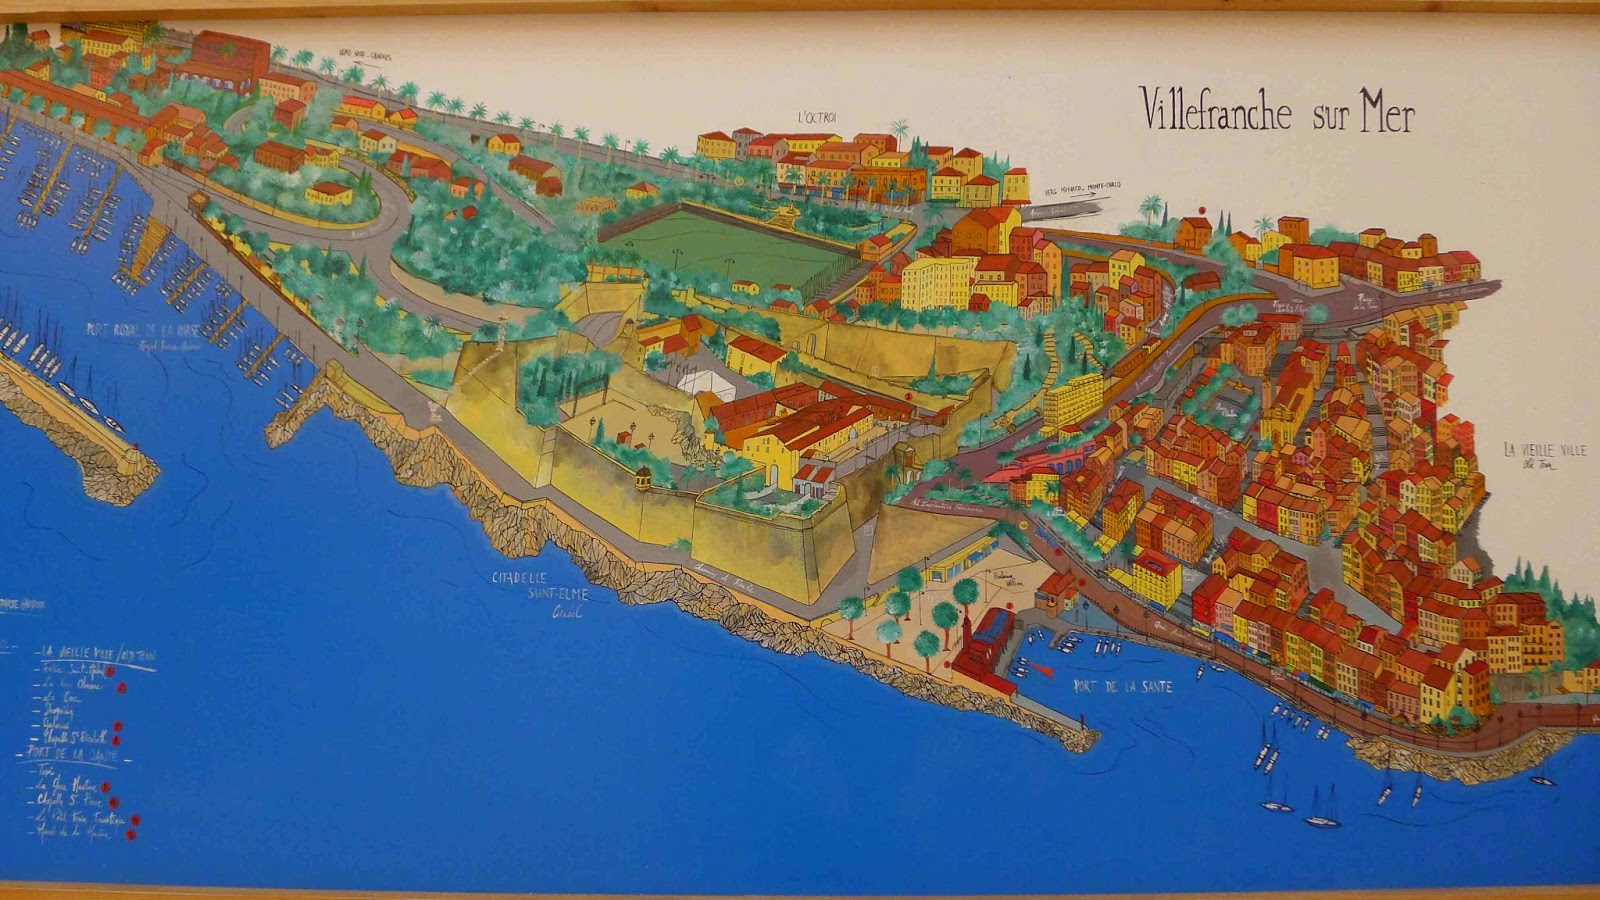 Map of Villefranche sur Mer